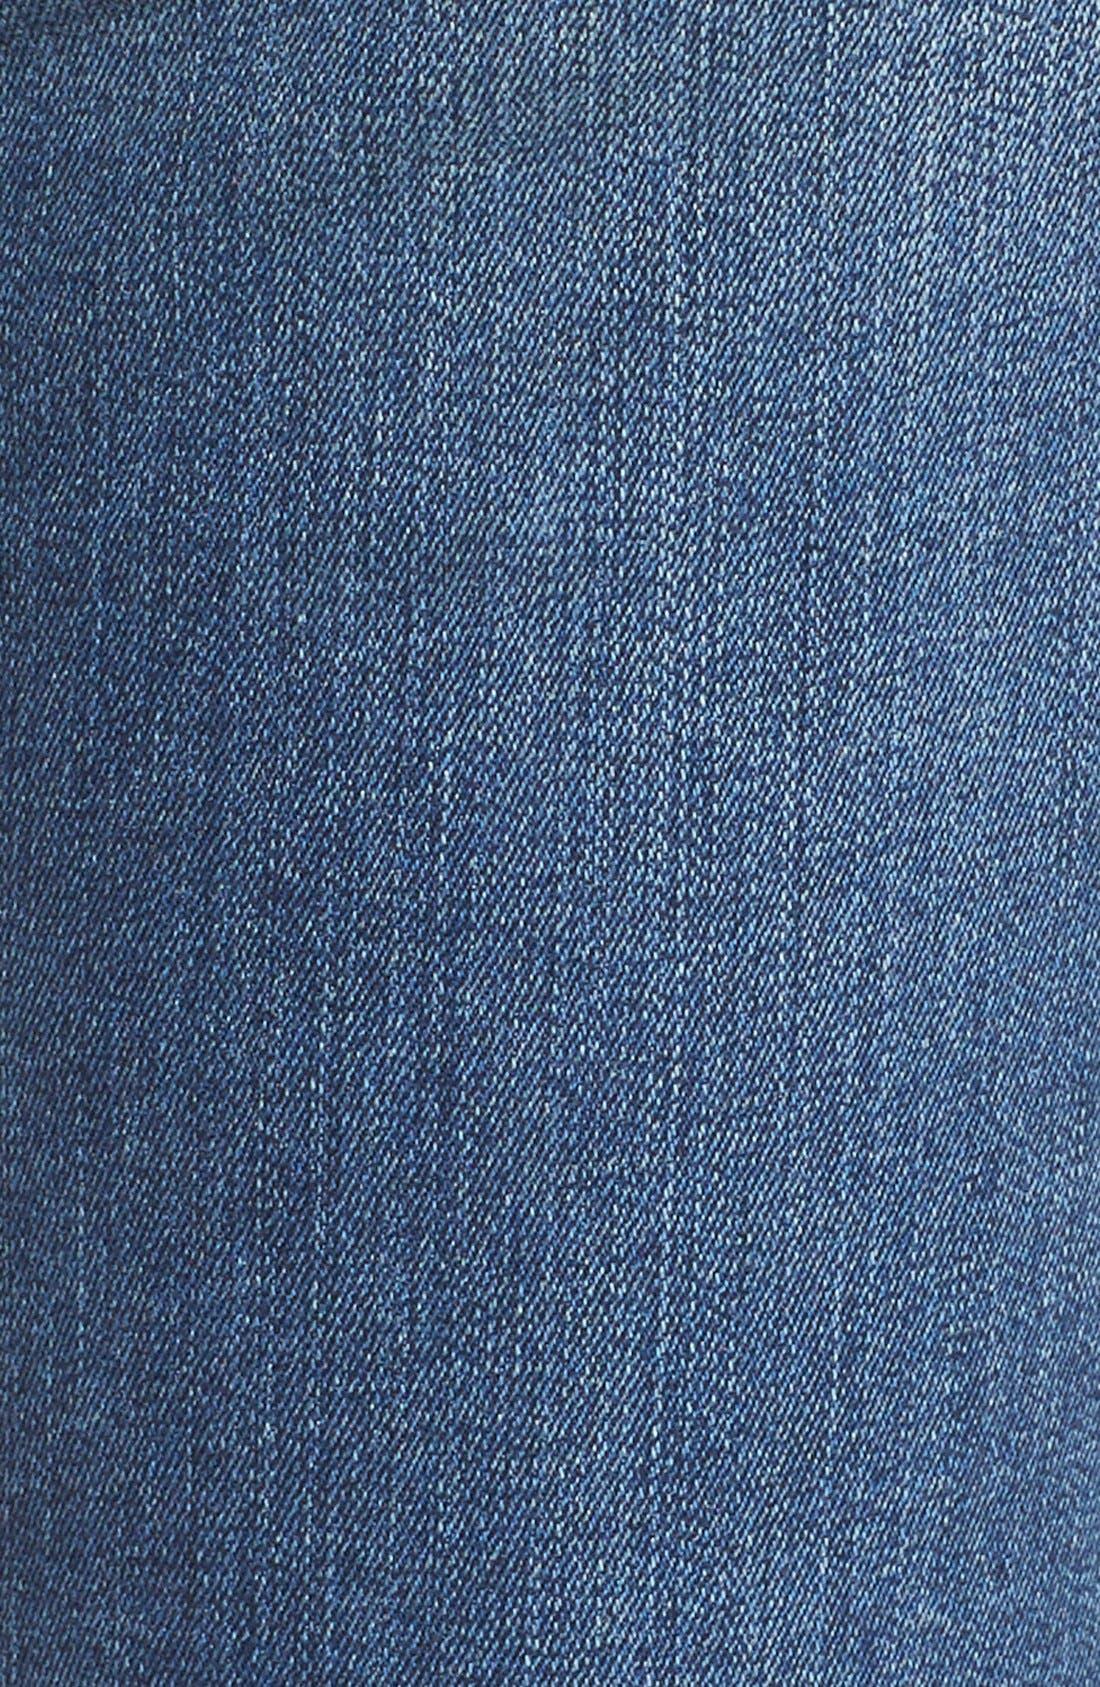 Alternate Image 5  - NYDJ 'Clarissa' Stretch Ankle Skinny Jeans (Heyburn) (Regular & Petite)